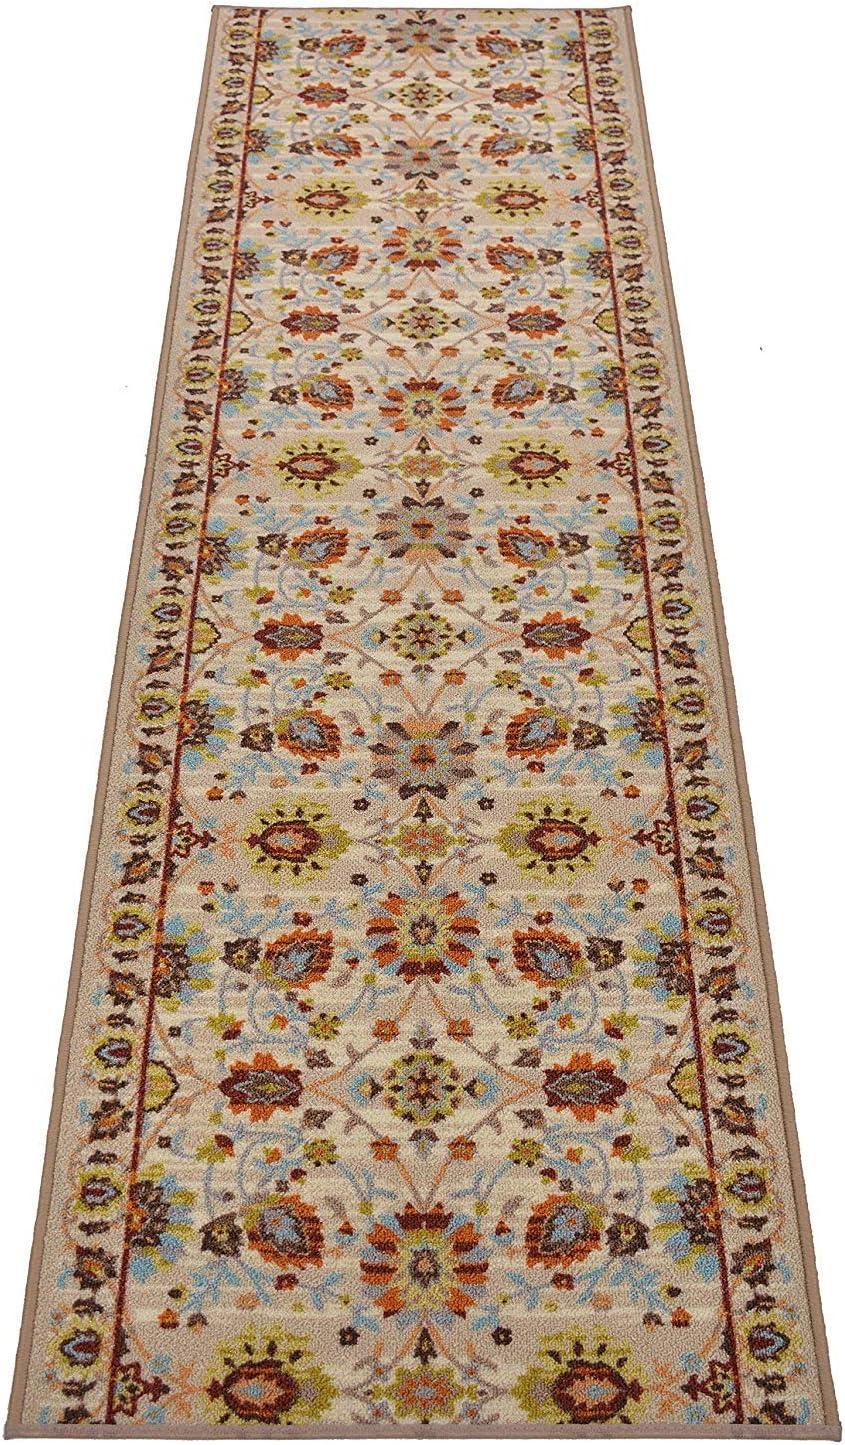 RugStylesOnline Custom Size Runner Mahal Design Run Roll Persian 大人気 店内限界値引き中 セルフラッピング無料